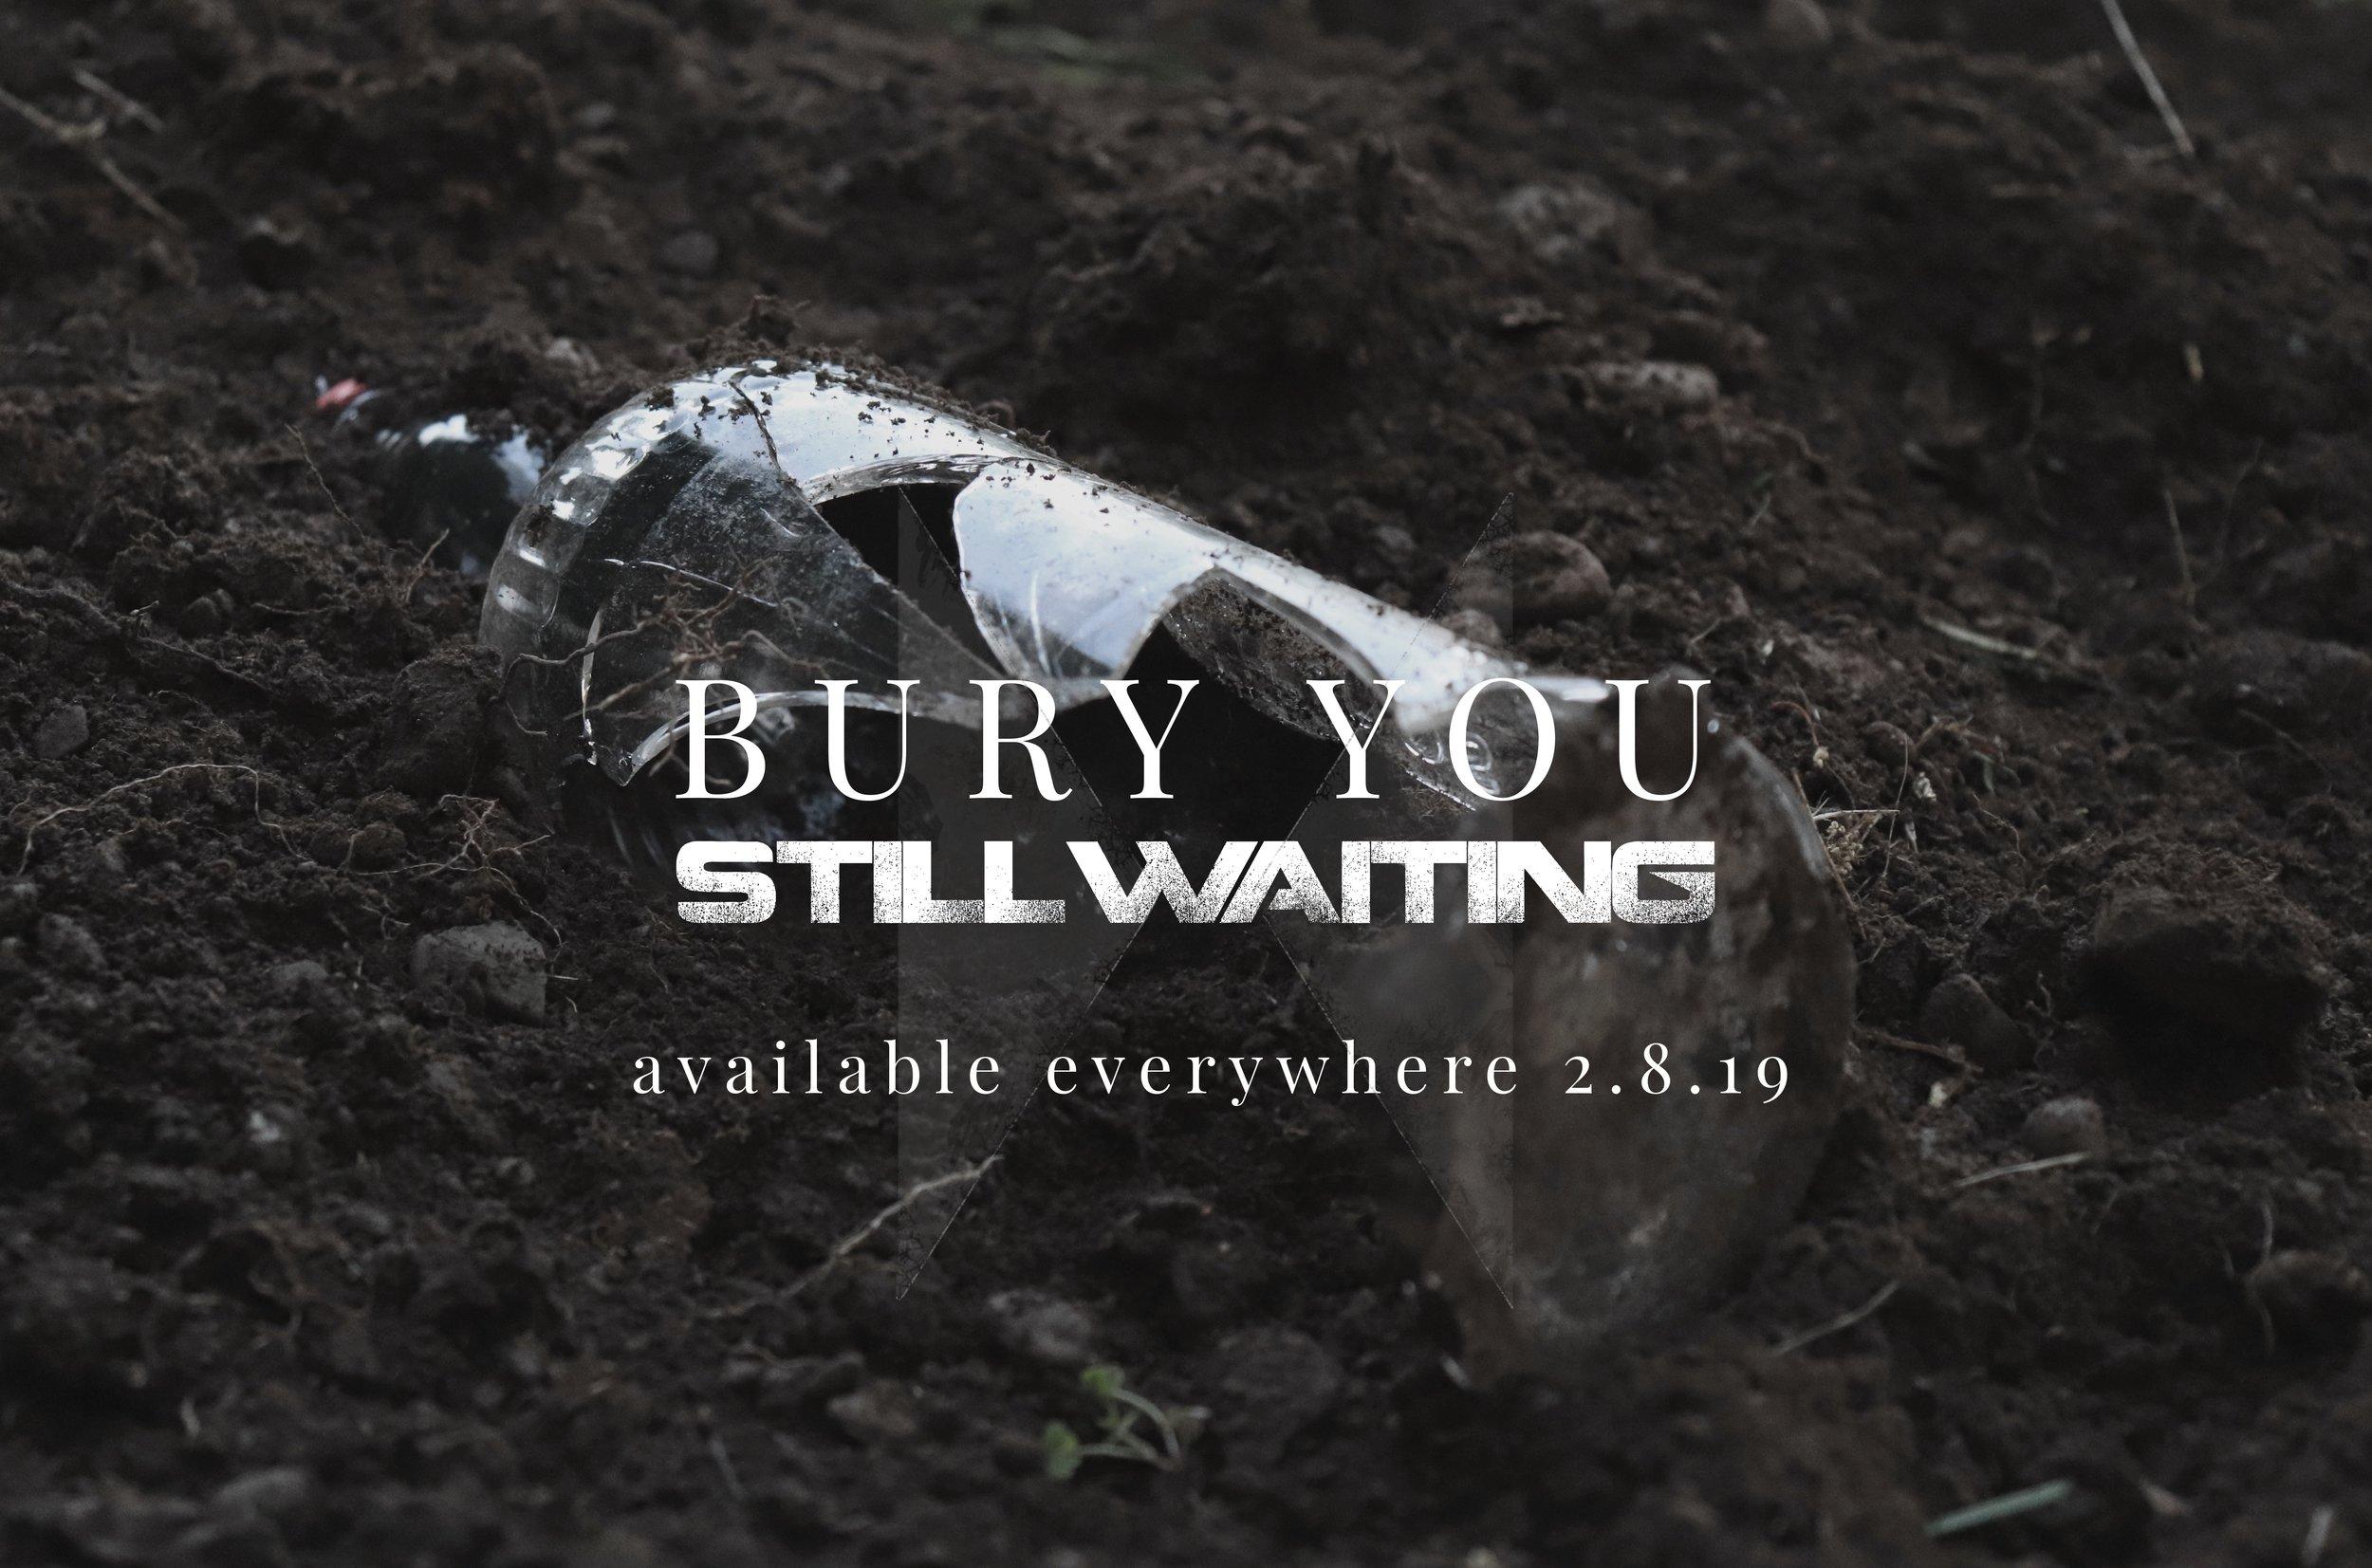 bury you website art.jpg